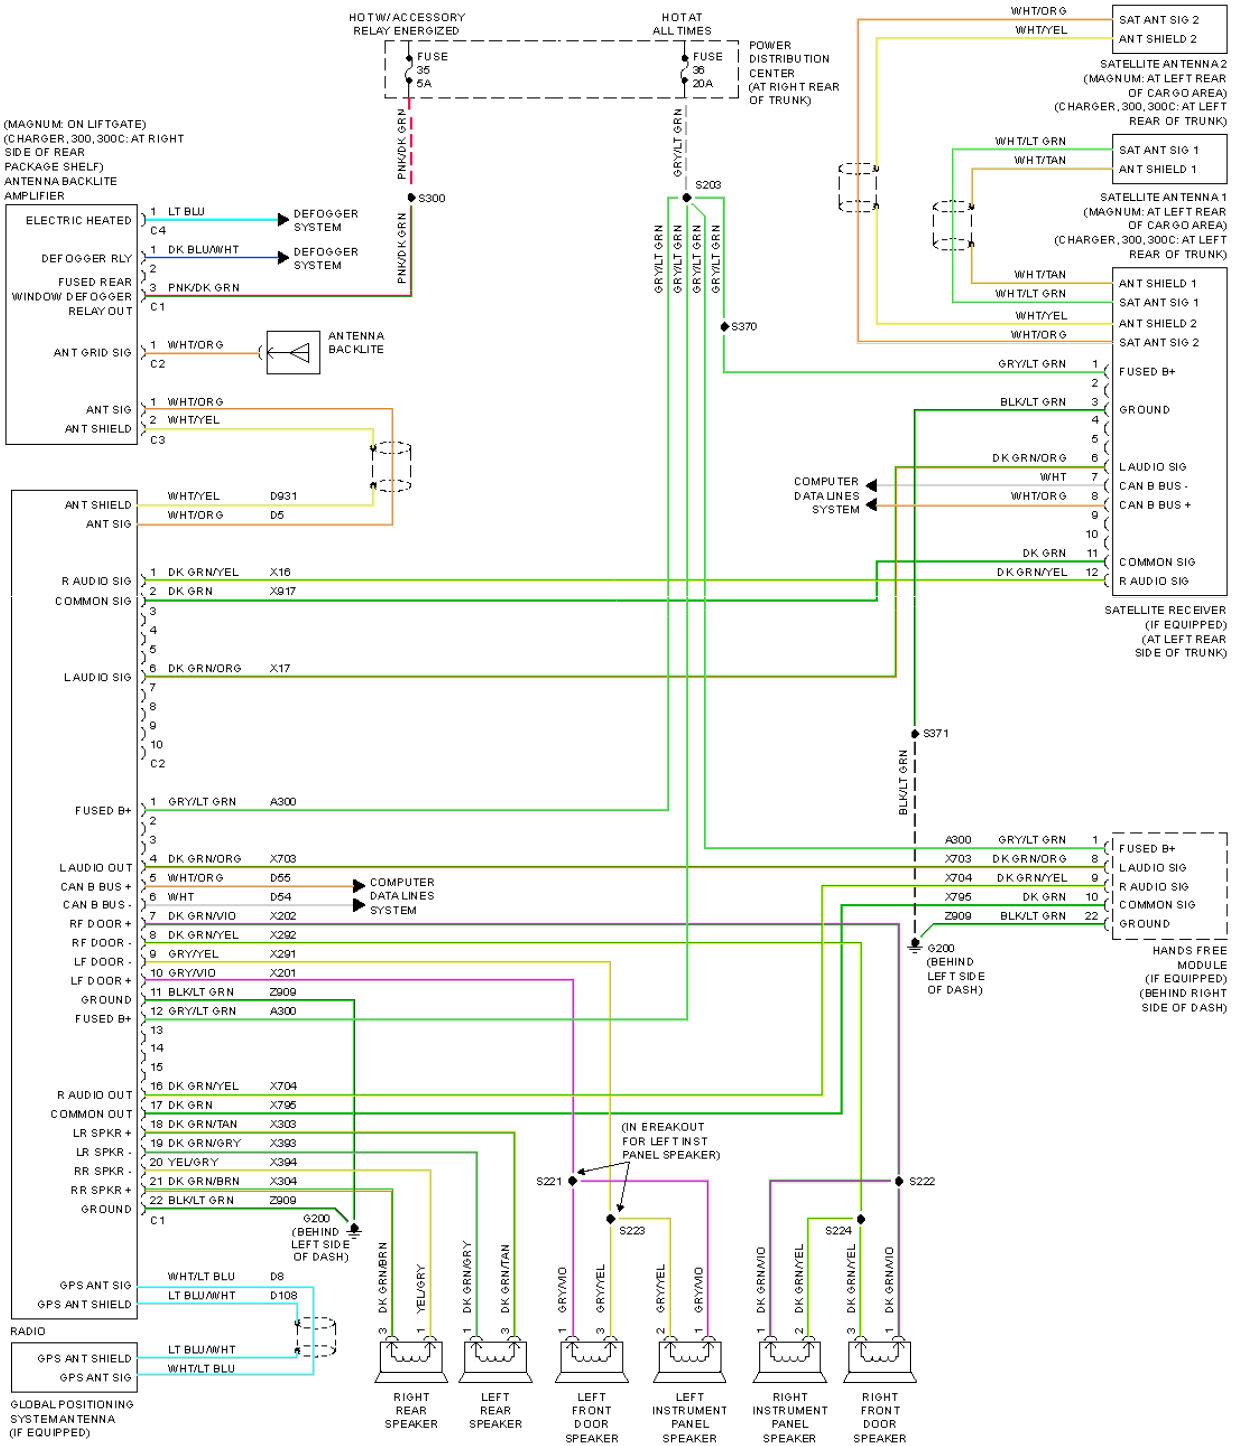 2011 ram headlight wiring diagram gsxr 750 wiring diagram, Wiring diagram